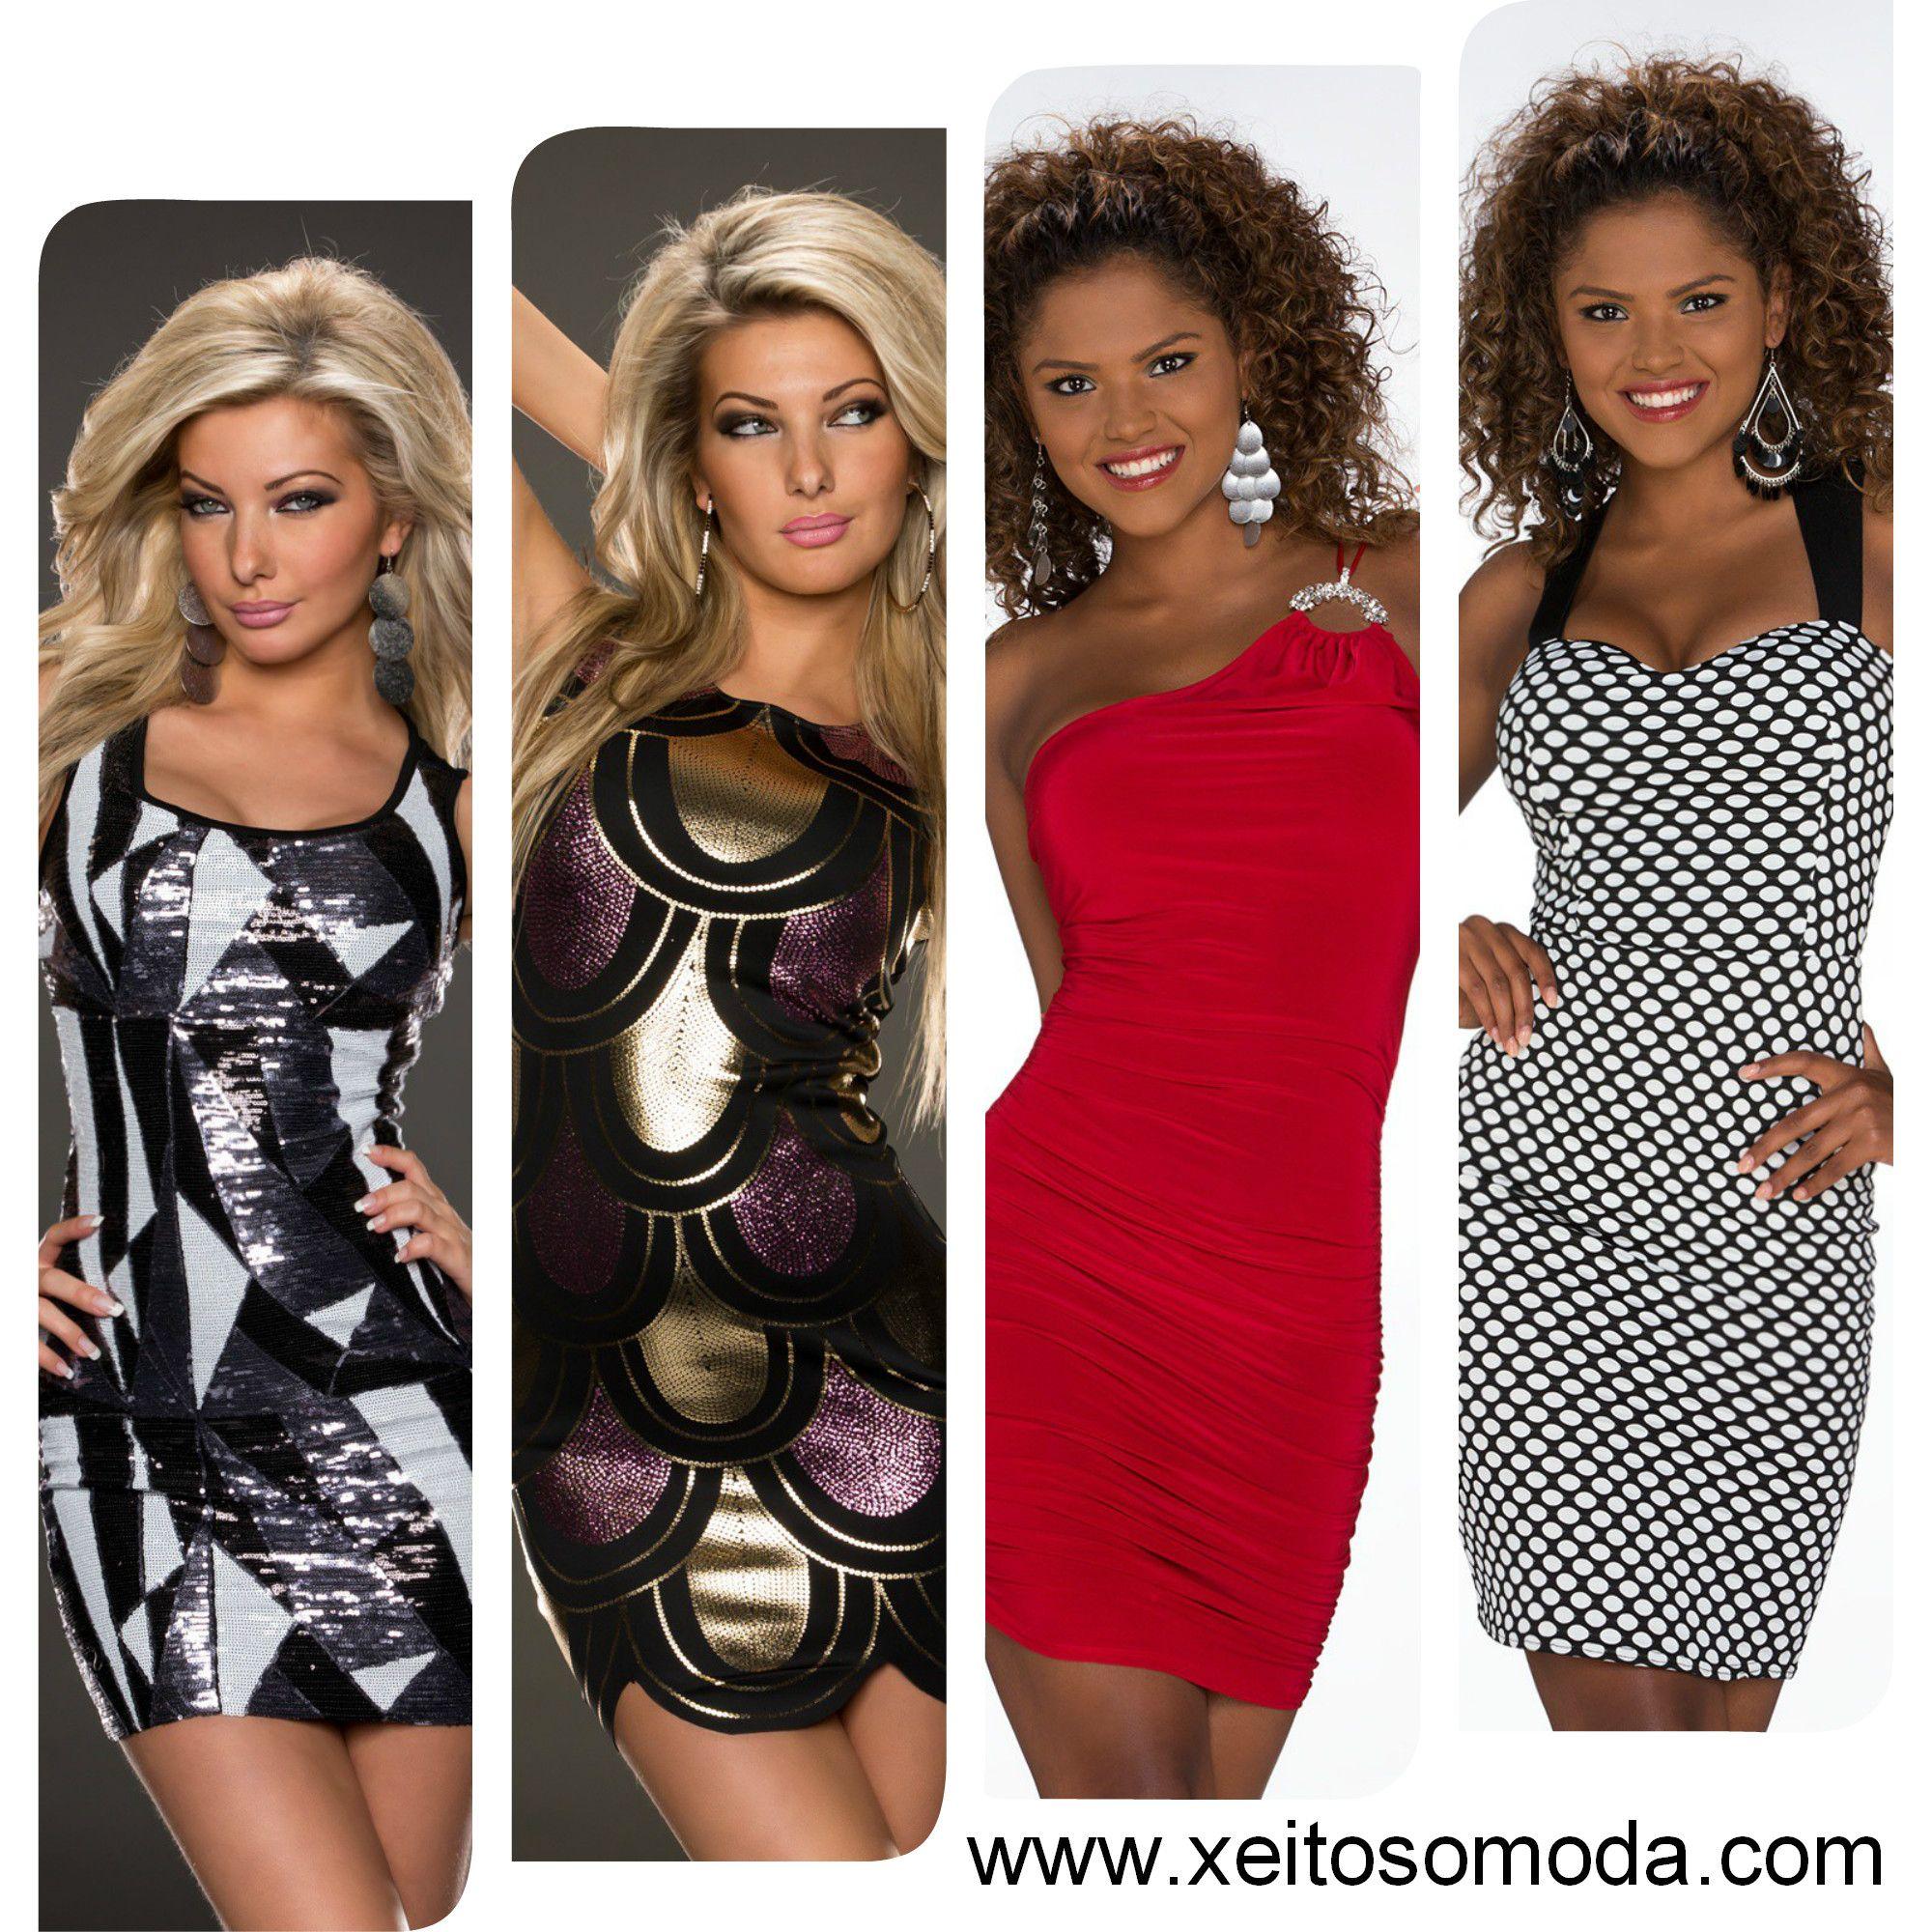 Ropa economica, vestidos para salir de marcha y fiesta, moda para chicas en España www.xeitosomoda.com